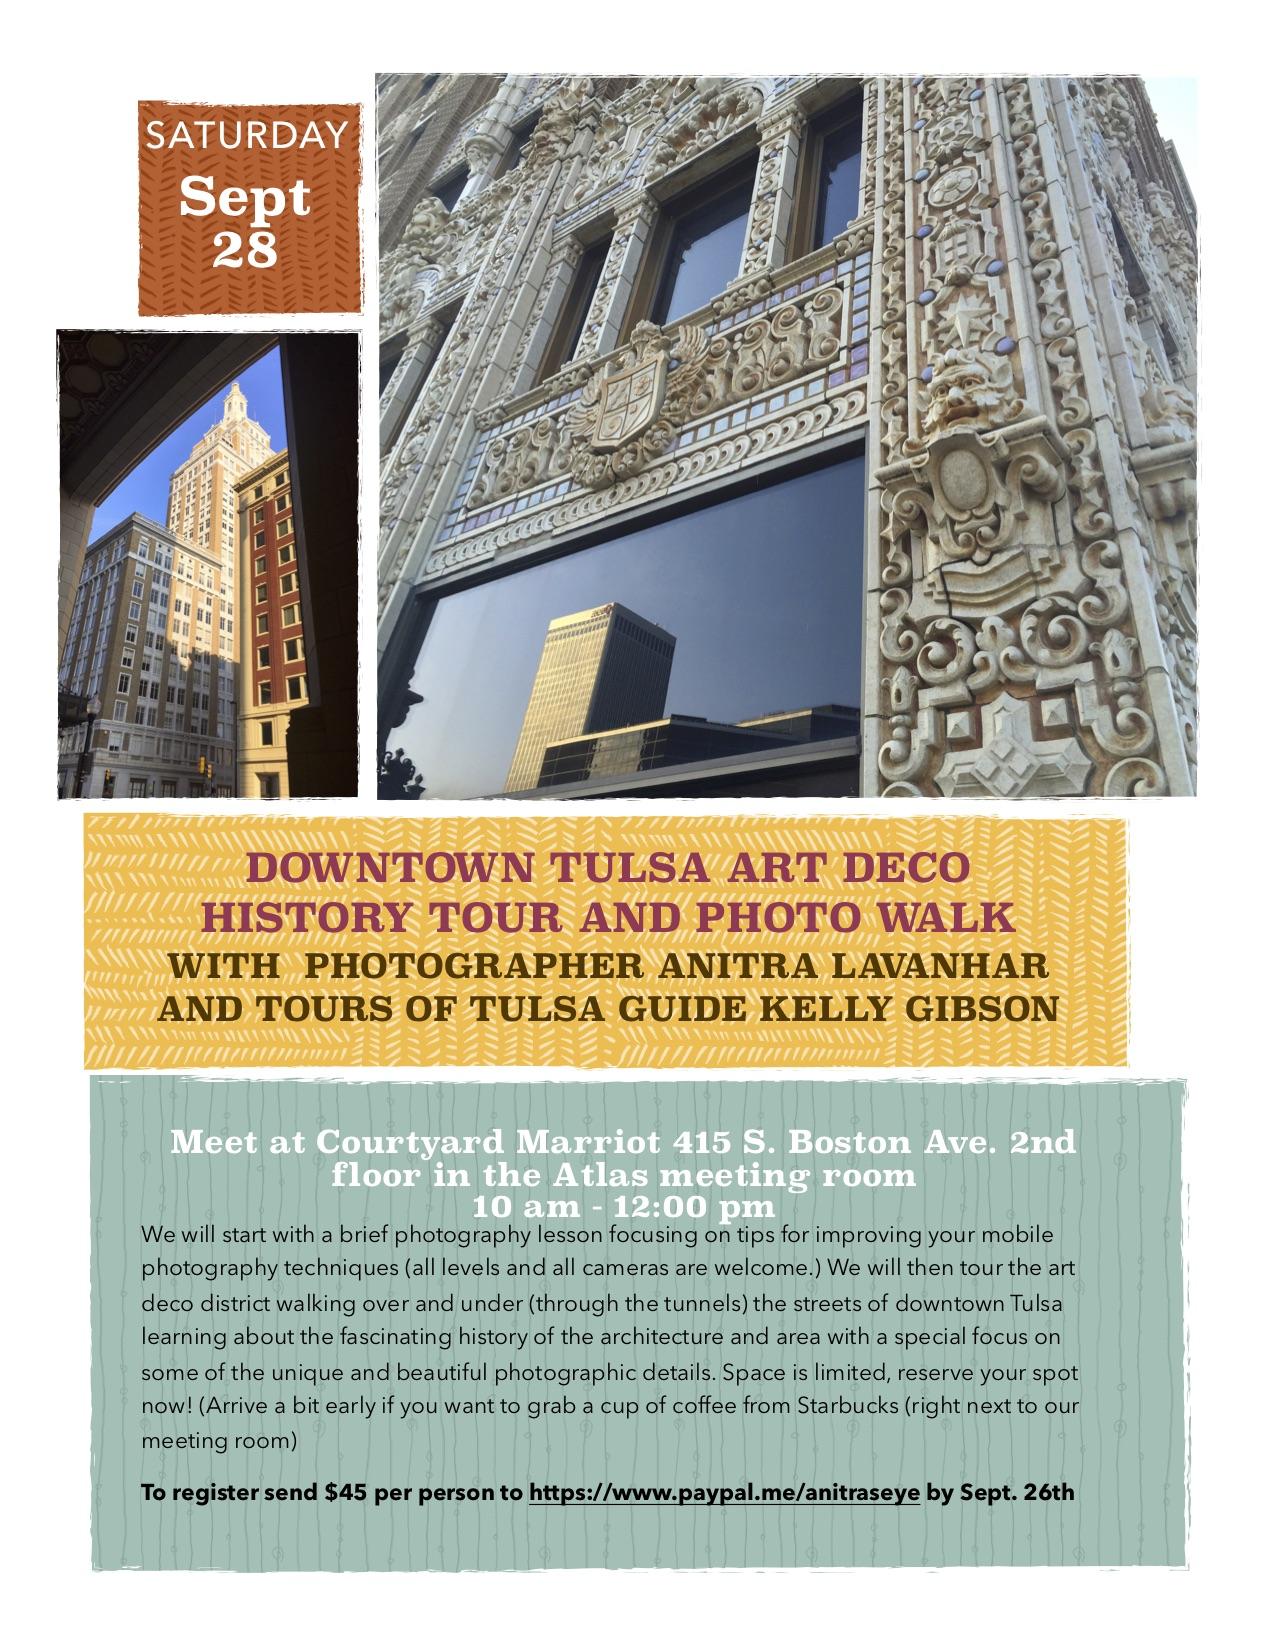 Downtown Tulsa Art Deco History Tour and Photowalk